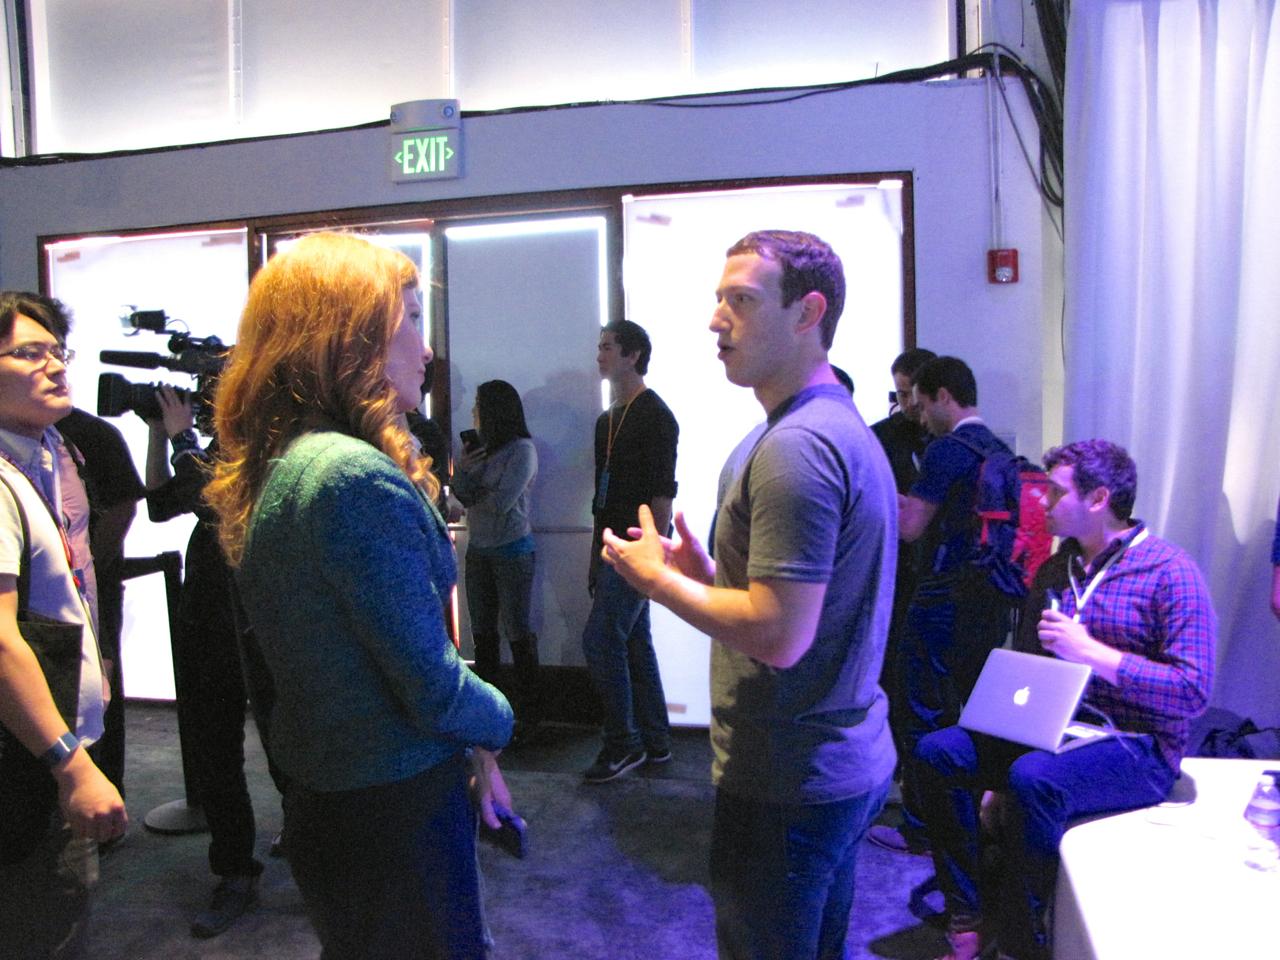 Facebook CEO Mark Zuckerberg giving an interview at F8 in San Francisco.